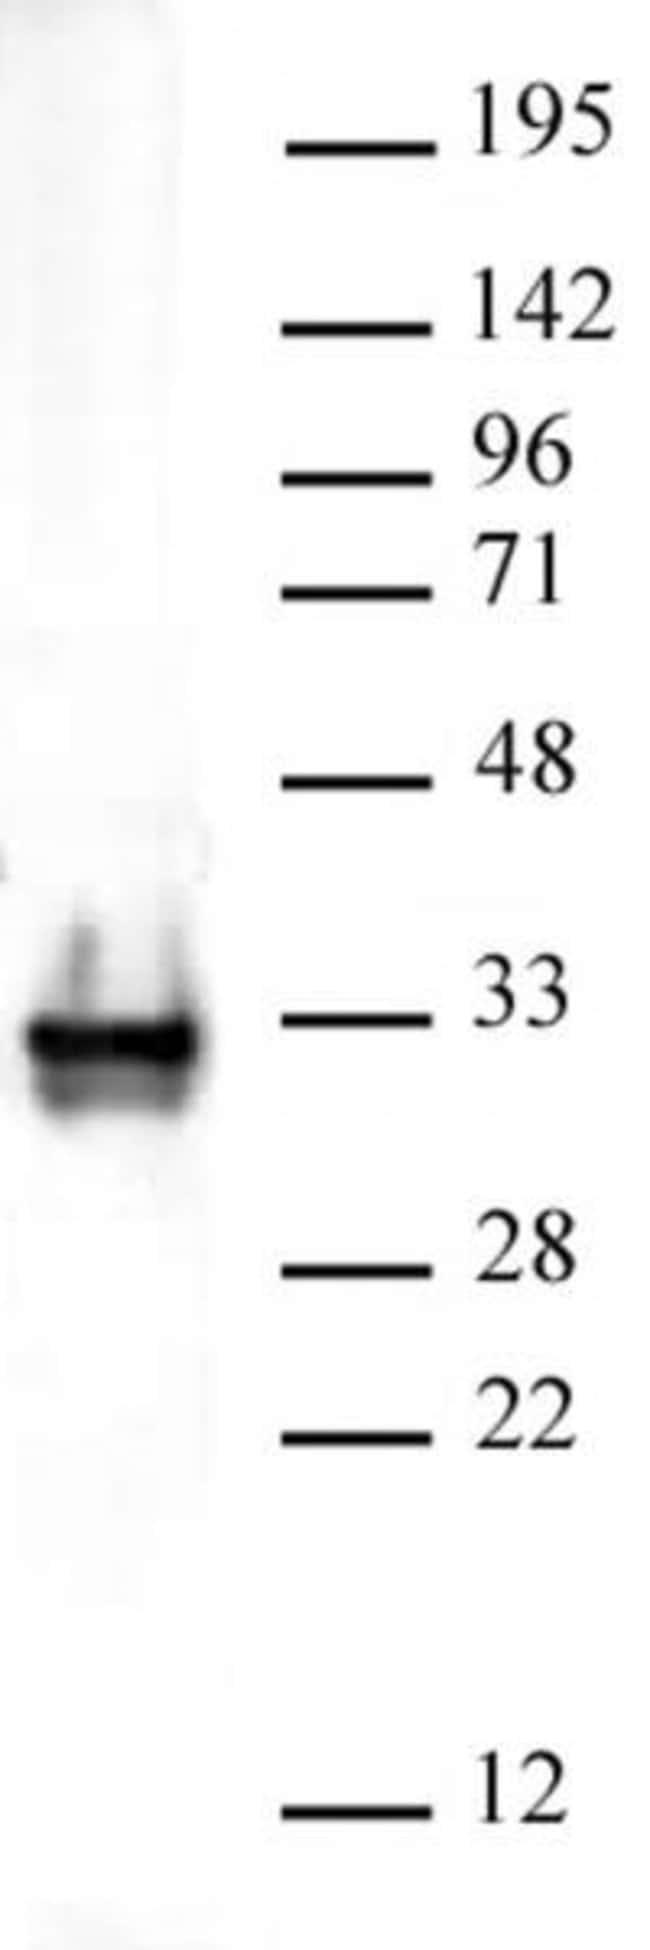 Histone H1 Rabbit anti-Human, Unconjugated, Polyclonal, Active Motif:Antibodies:Primary